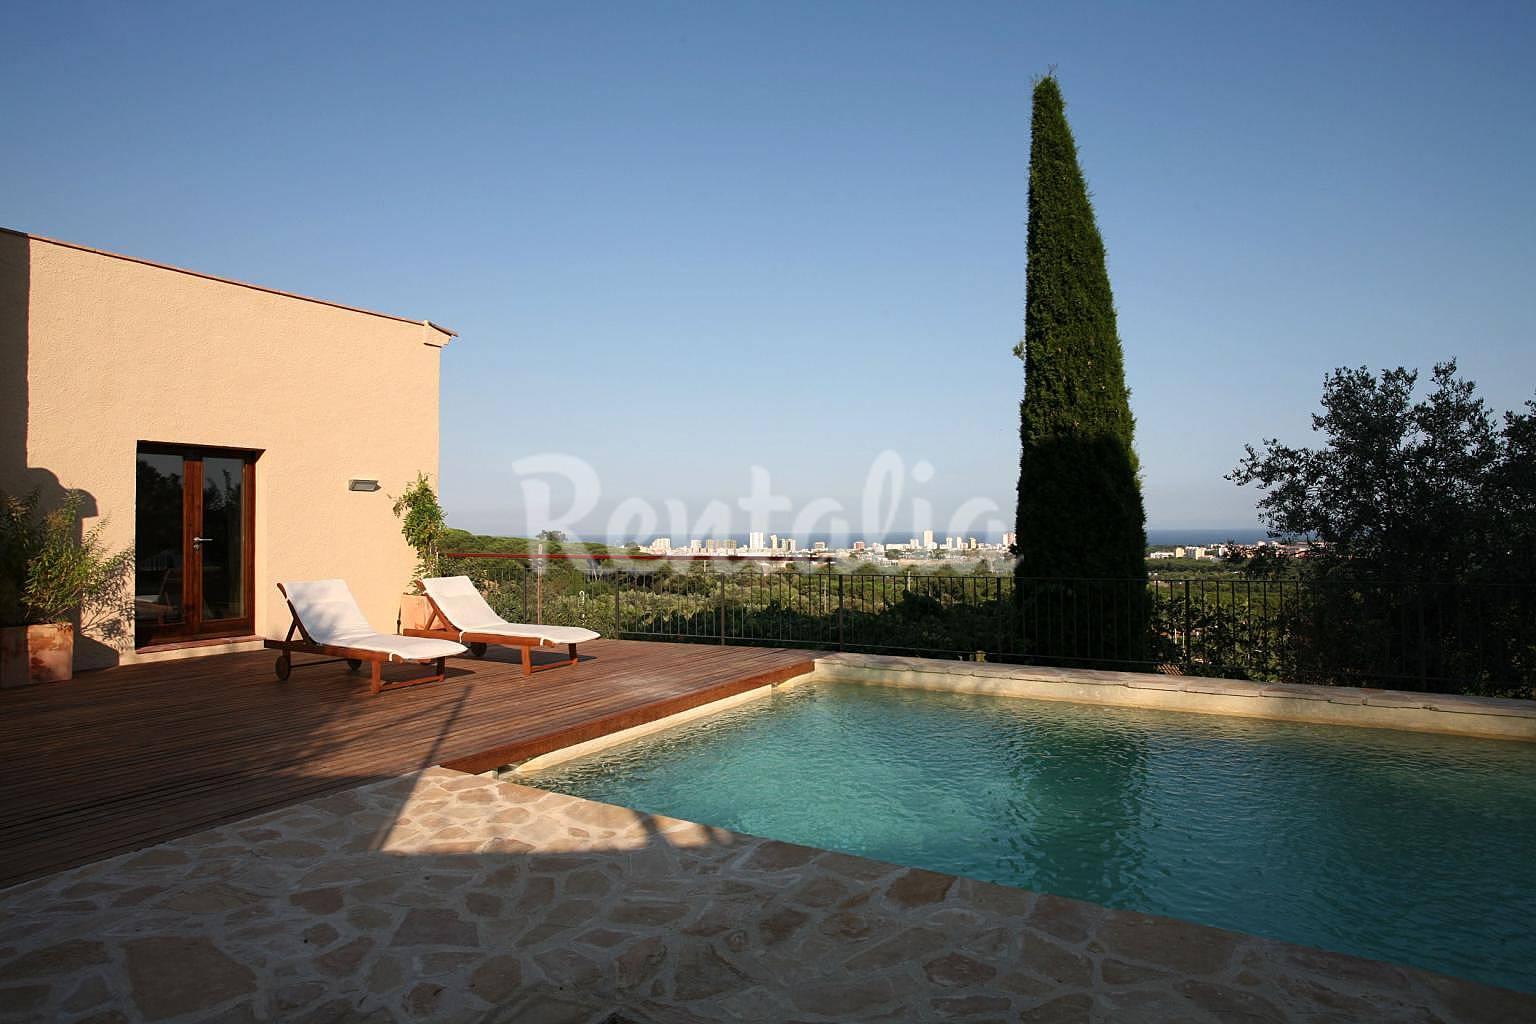 Casa en alquiler a 2 km de la playa castell d 39 aro for Alquiler casa en umbrete sevilla